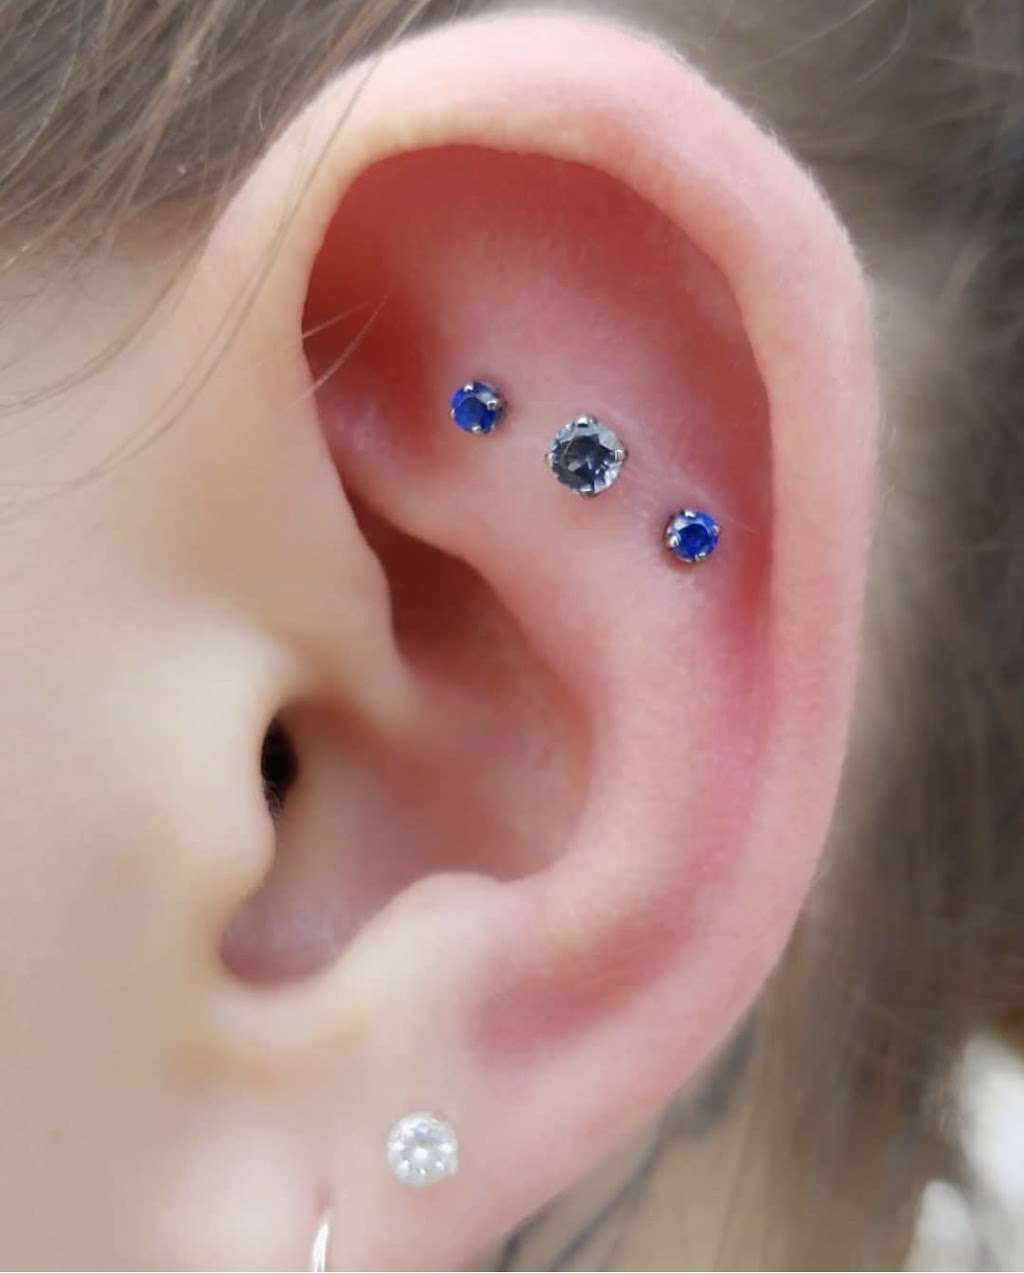 Royal Heritage Tattoo & Piercing - jewelry store  | Photo 2 of 10 | Address: 1515 Abbot Kinney Blvd, Venice, CA 90291, USA | Phone: (323) 782-9977